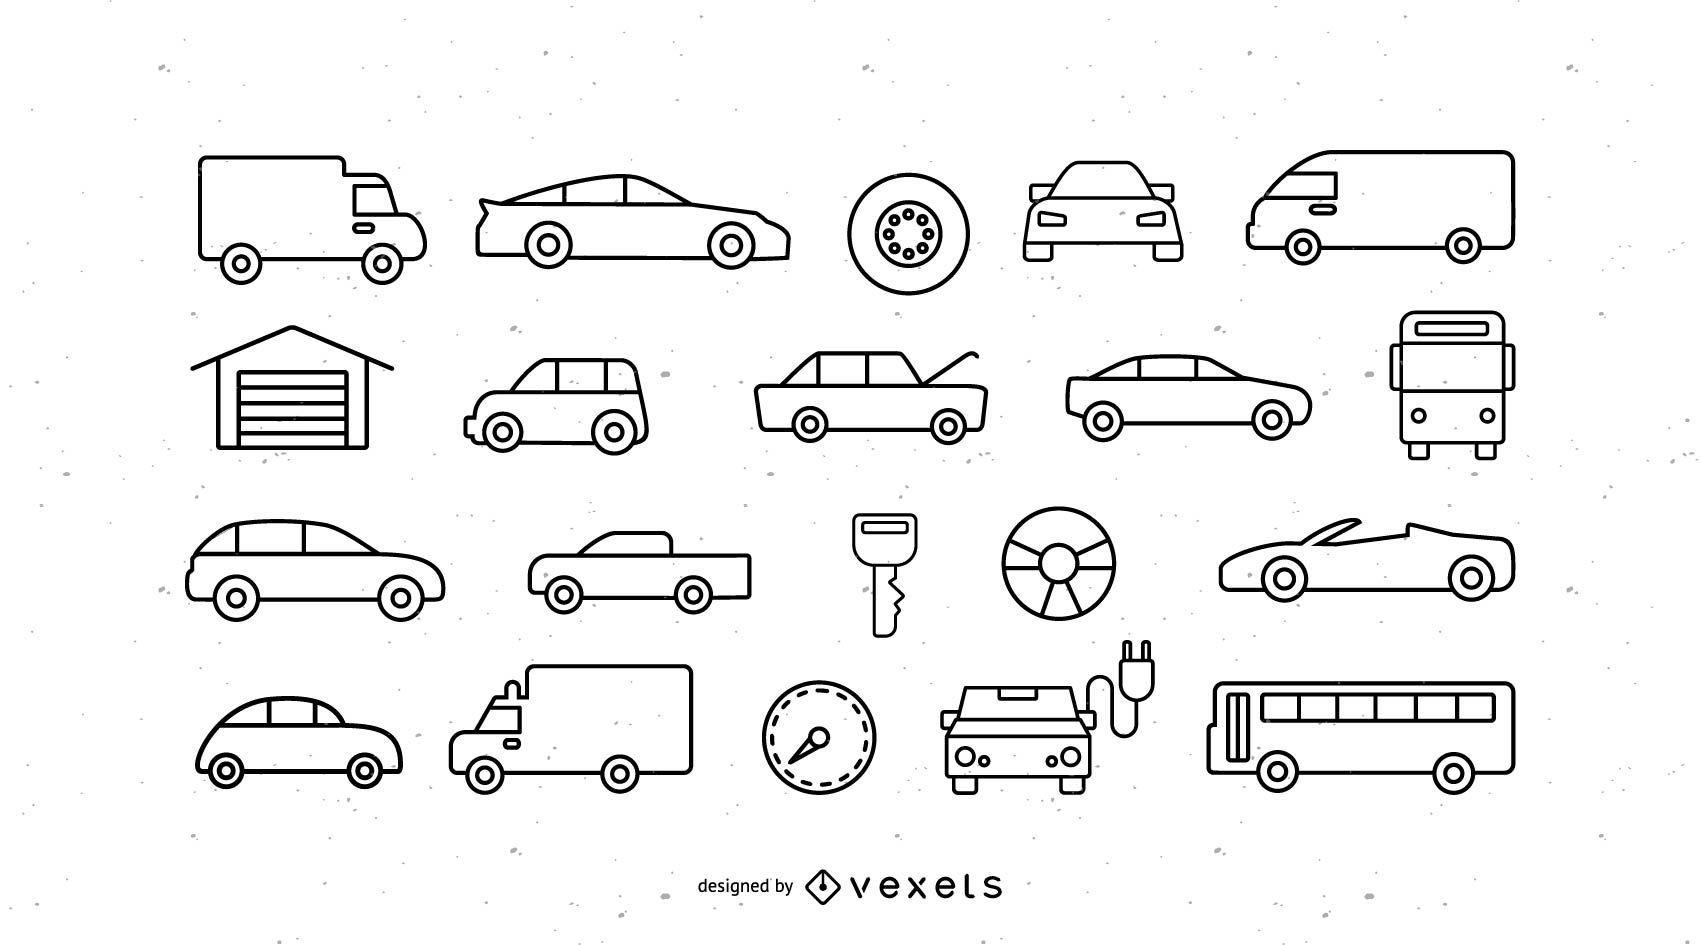 Vehicles stroke icon set